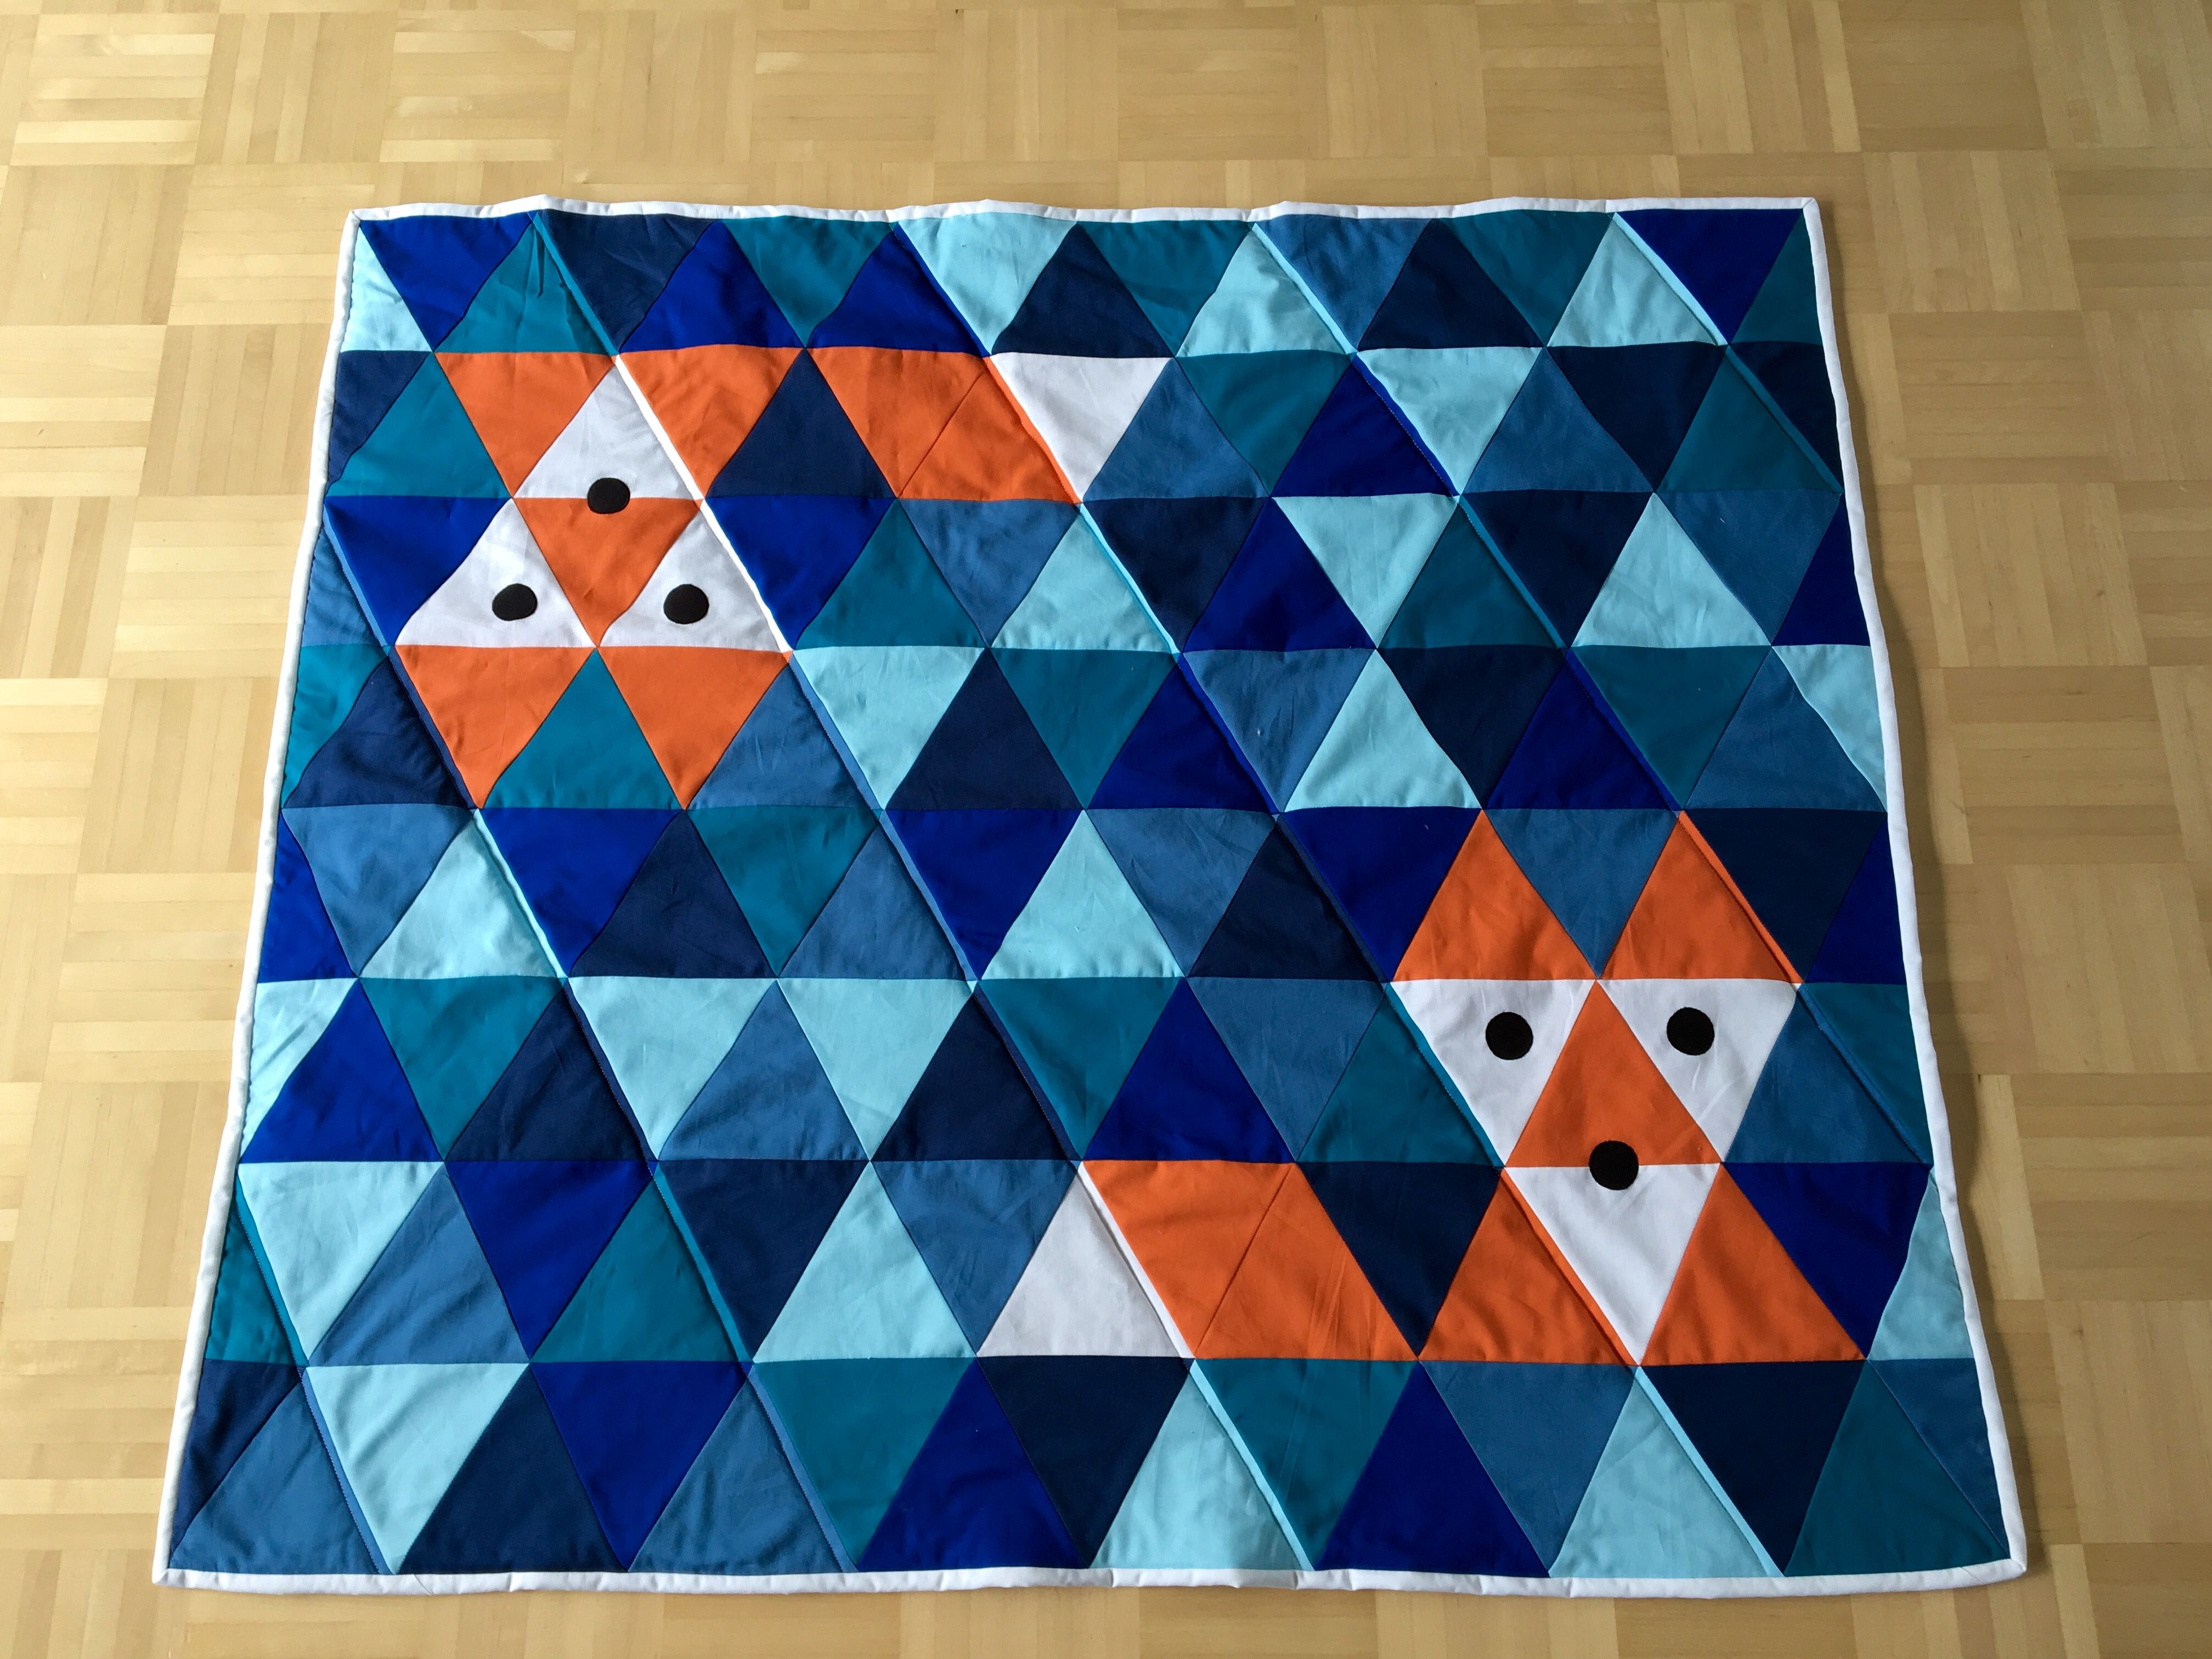 Patchworkdecke+aus+Dreiecken | Schnittmuster, Ideen und Tipps ...